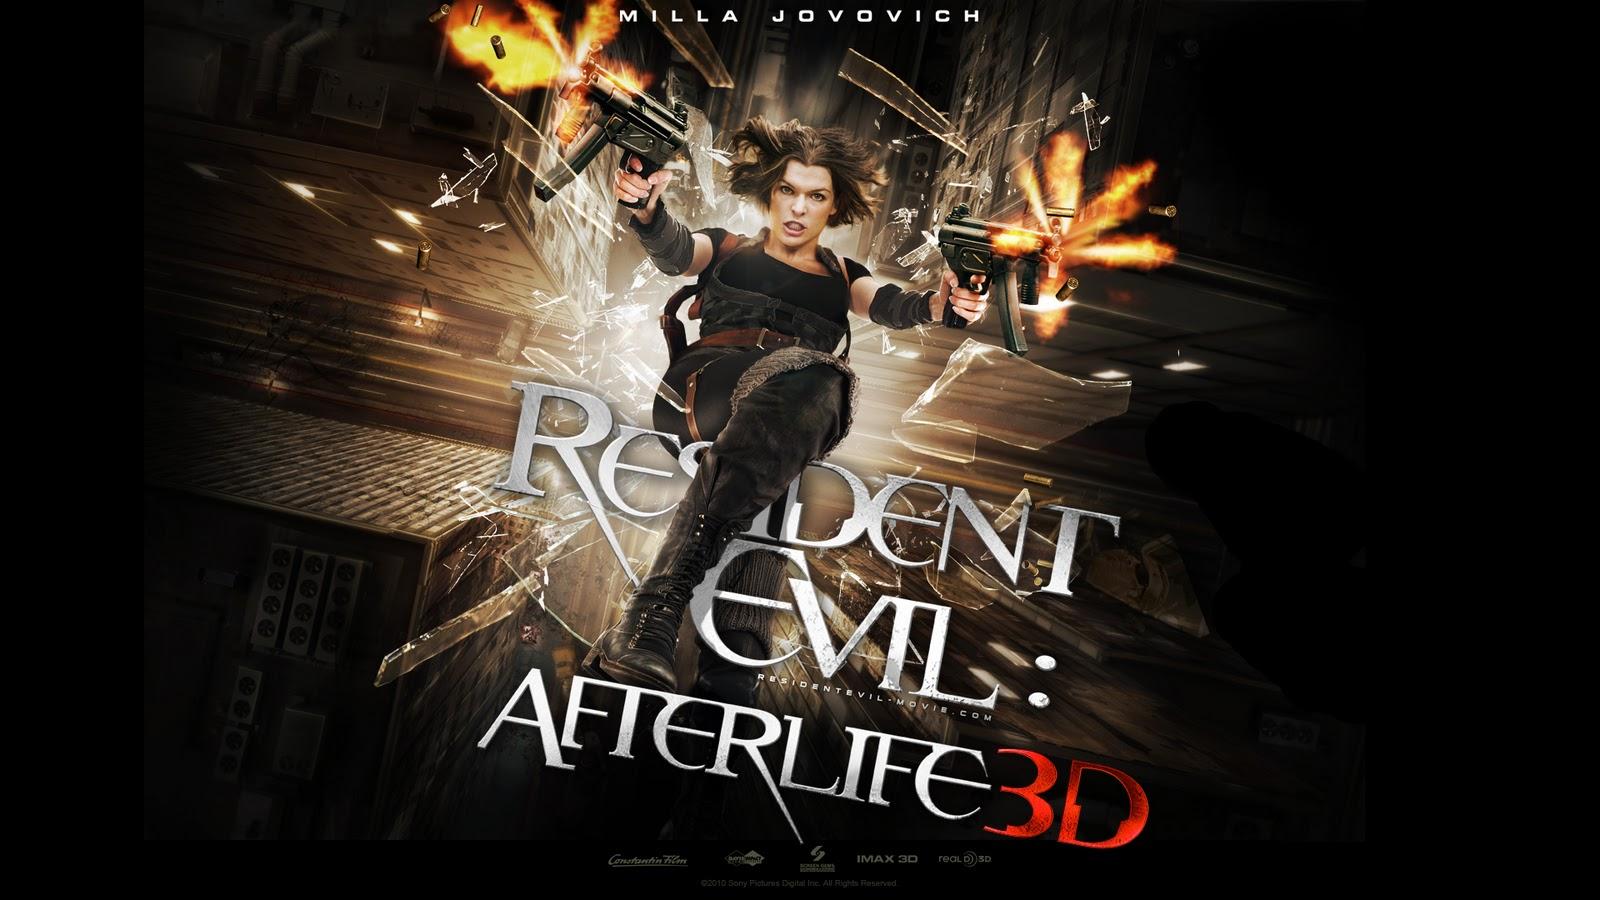 http://2.bp.blogspot.com/_aZglG_bXg-A/TM1seYMizhI/AAAAAAAAAPg/GVZltwv7b1U/s1600/Milla_Jovovich_in_Resident_Evil-_Afterlife_Wallpaper_1_1280.jpg